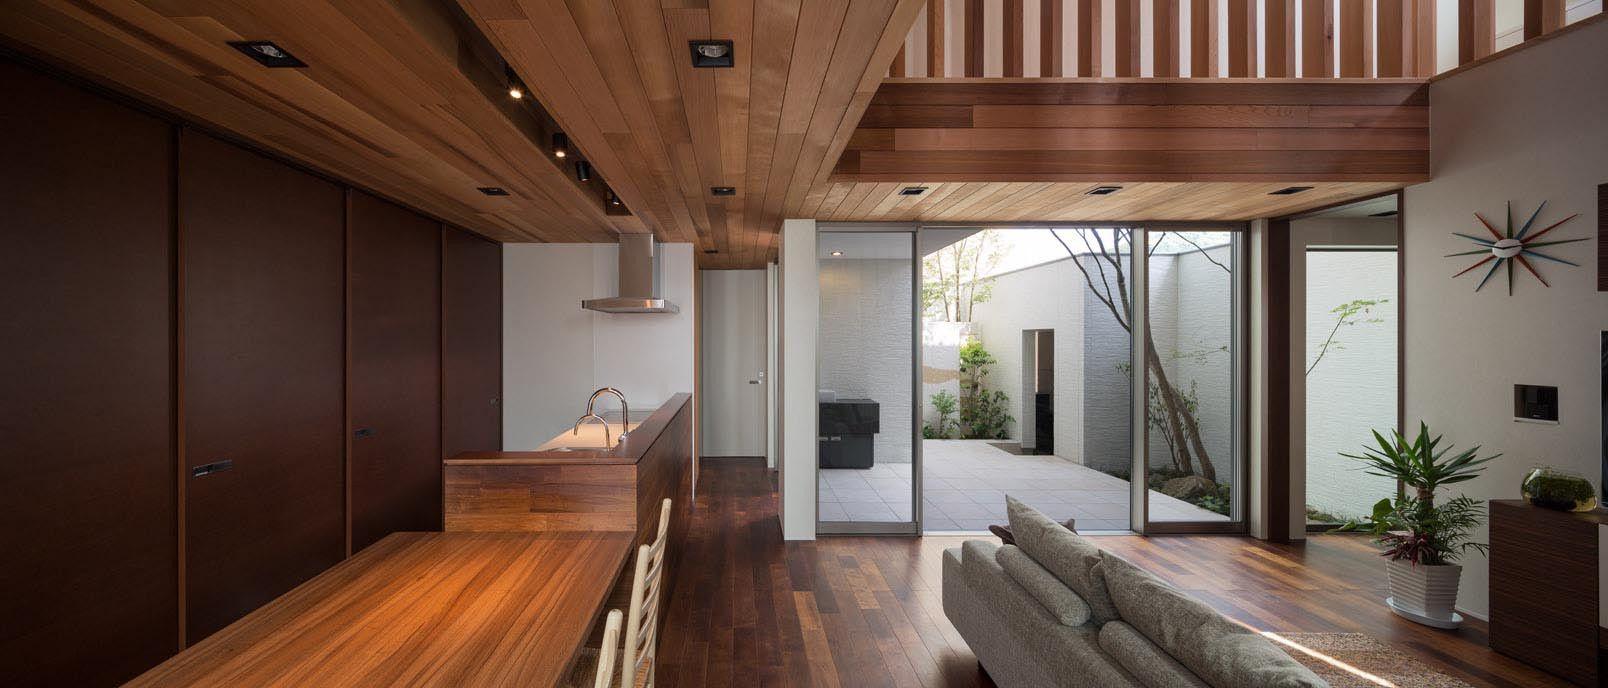 Architect show  house living spacesliving room designsinterior also lovely interiors pinterest architects rh